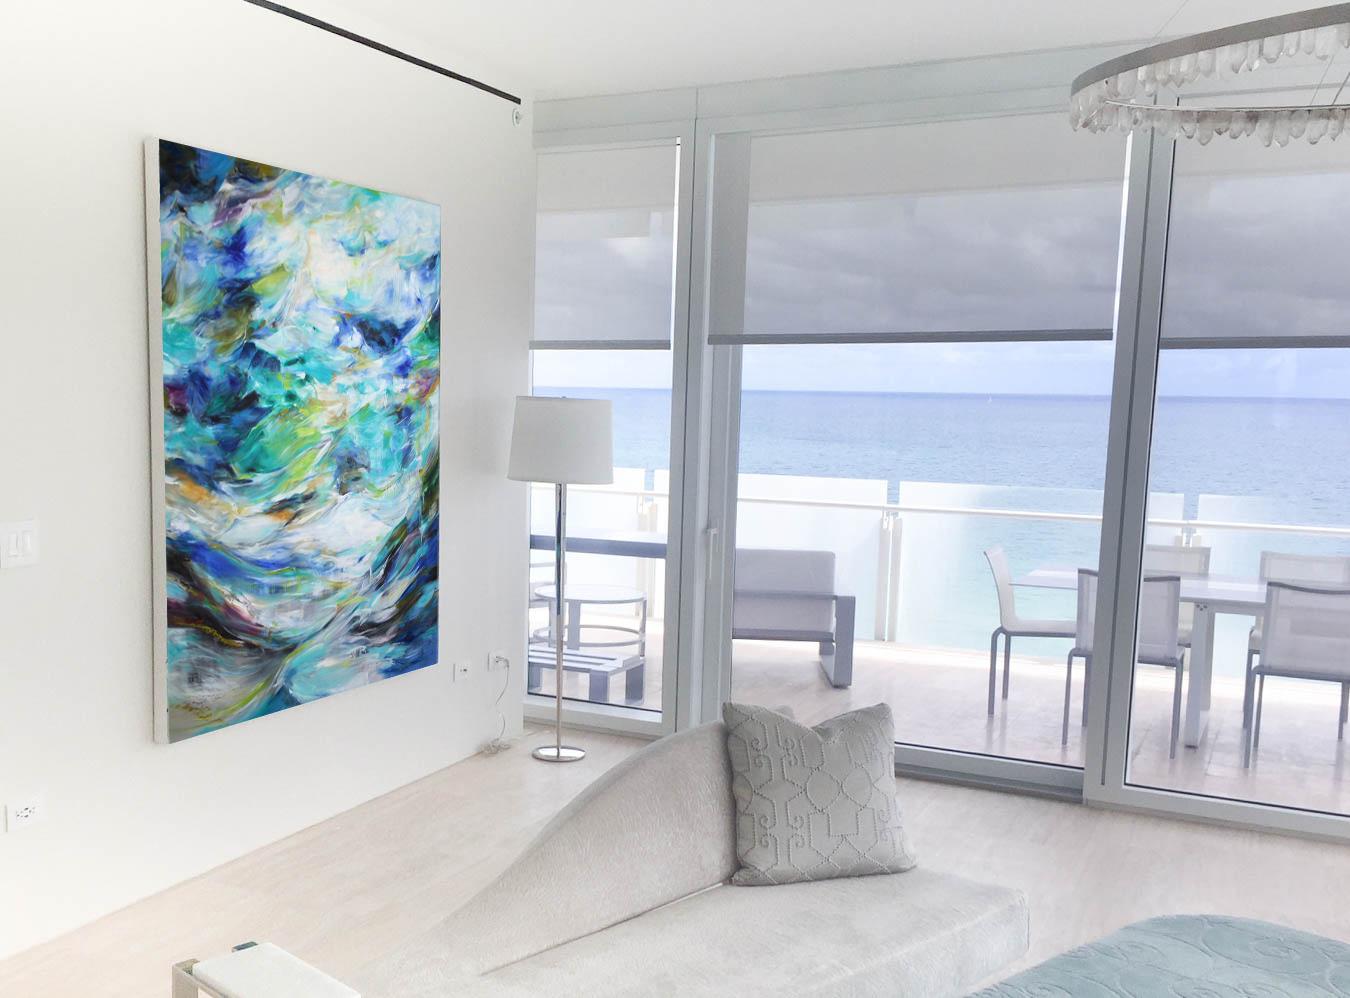 Installation of  Soul Sea I  (2017)  Natalia Wróbel . Oil on canvas. 72x60 in.